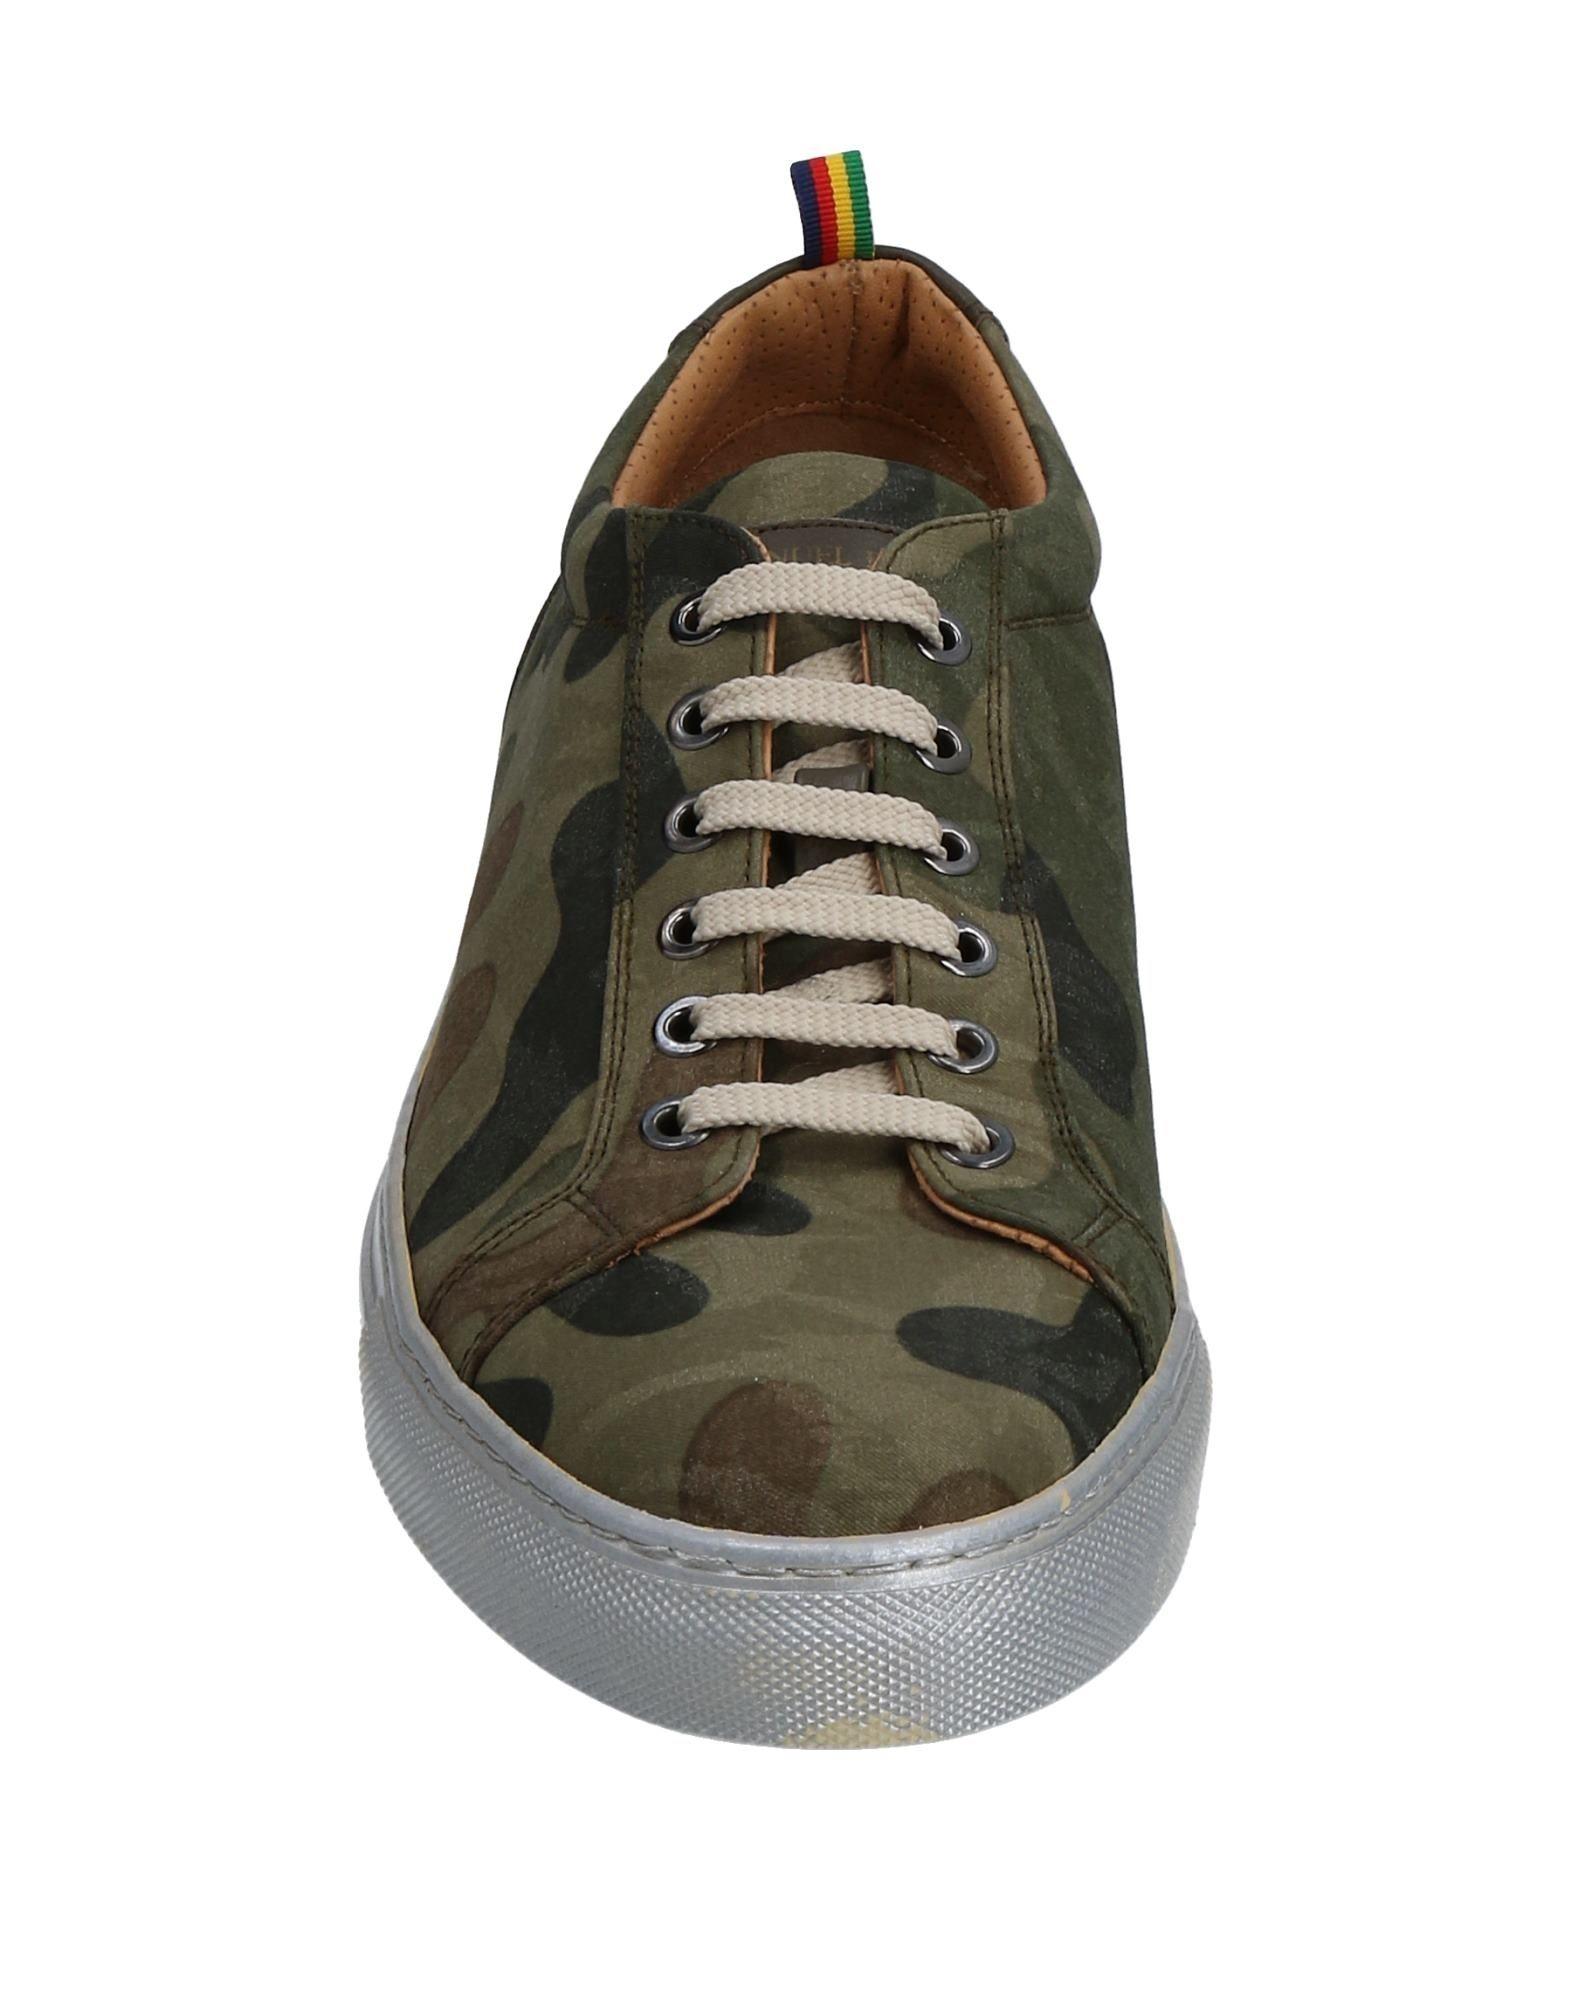 Rabatt echte Schuhe  Manuel Ritz Sneakers Herren  Schuhe 11531183UK 8277a9